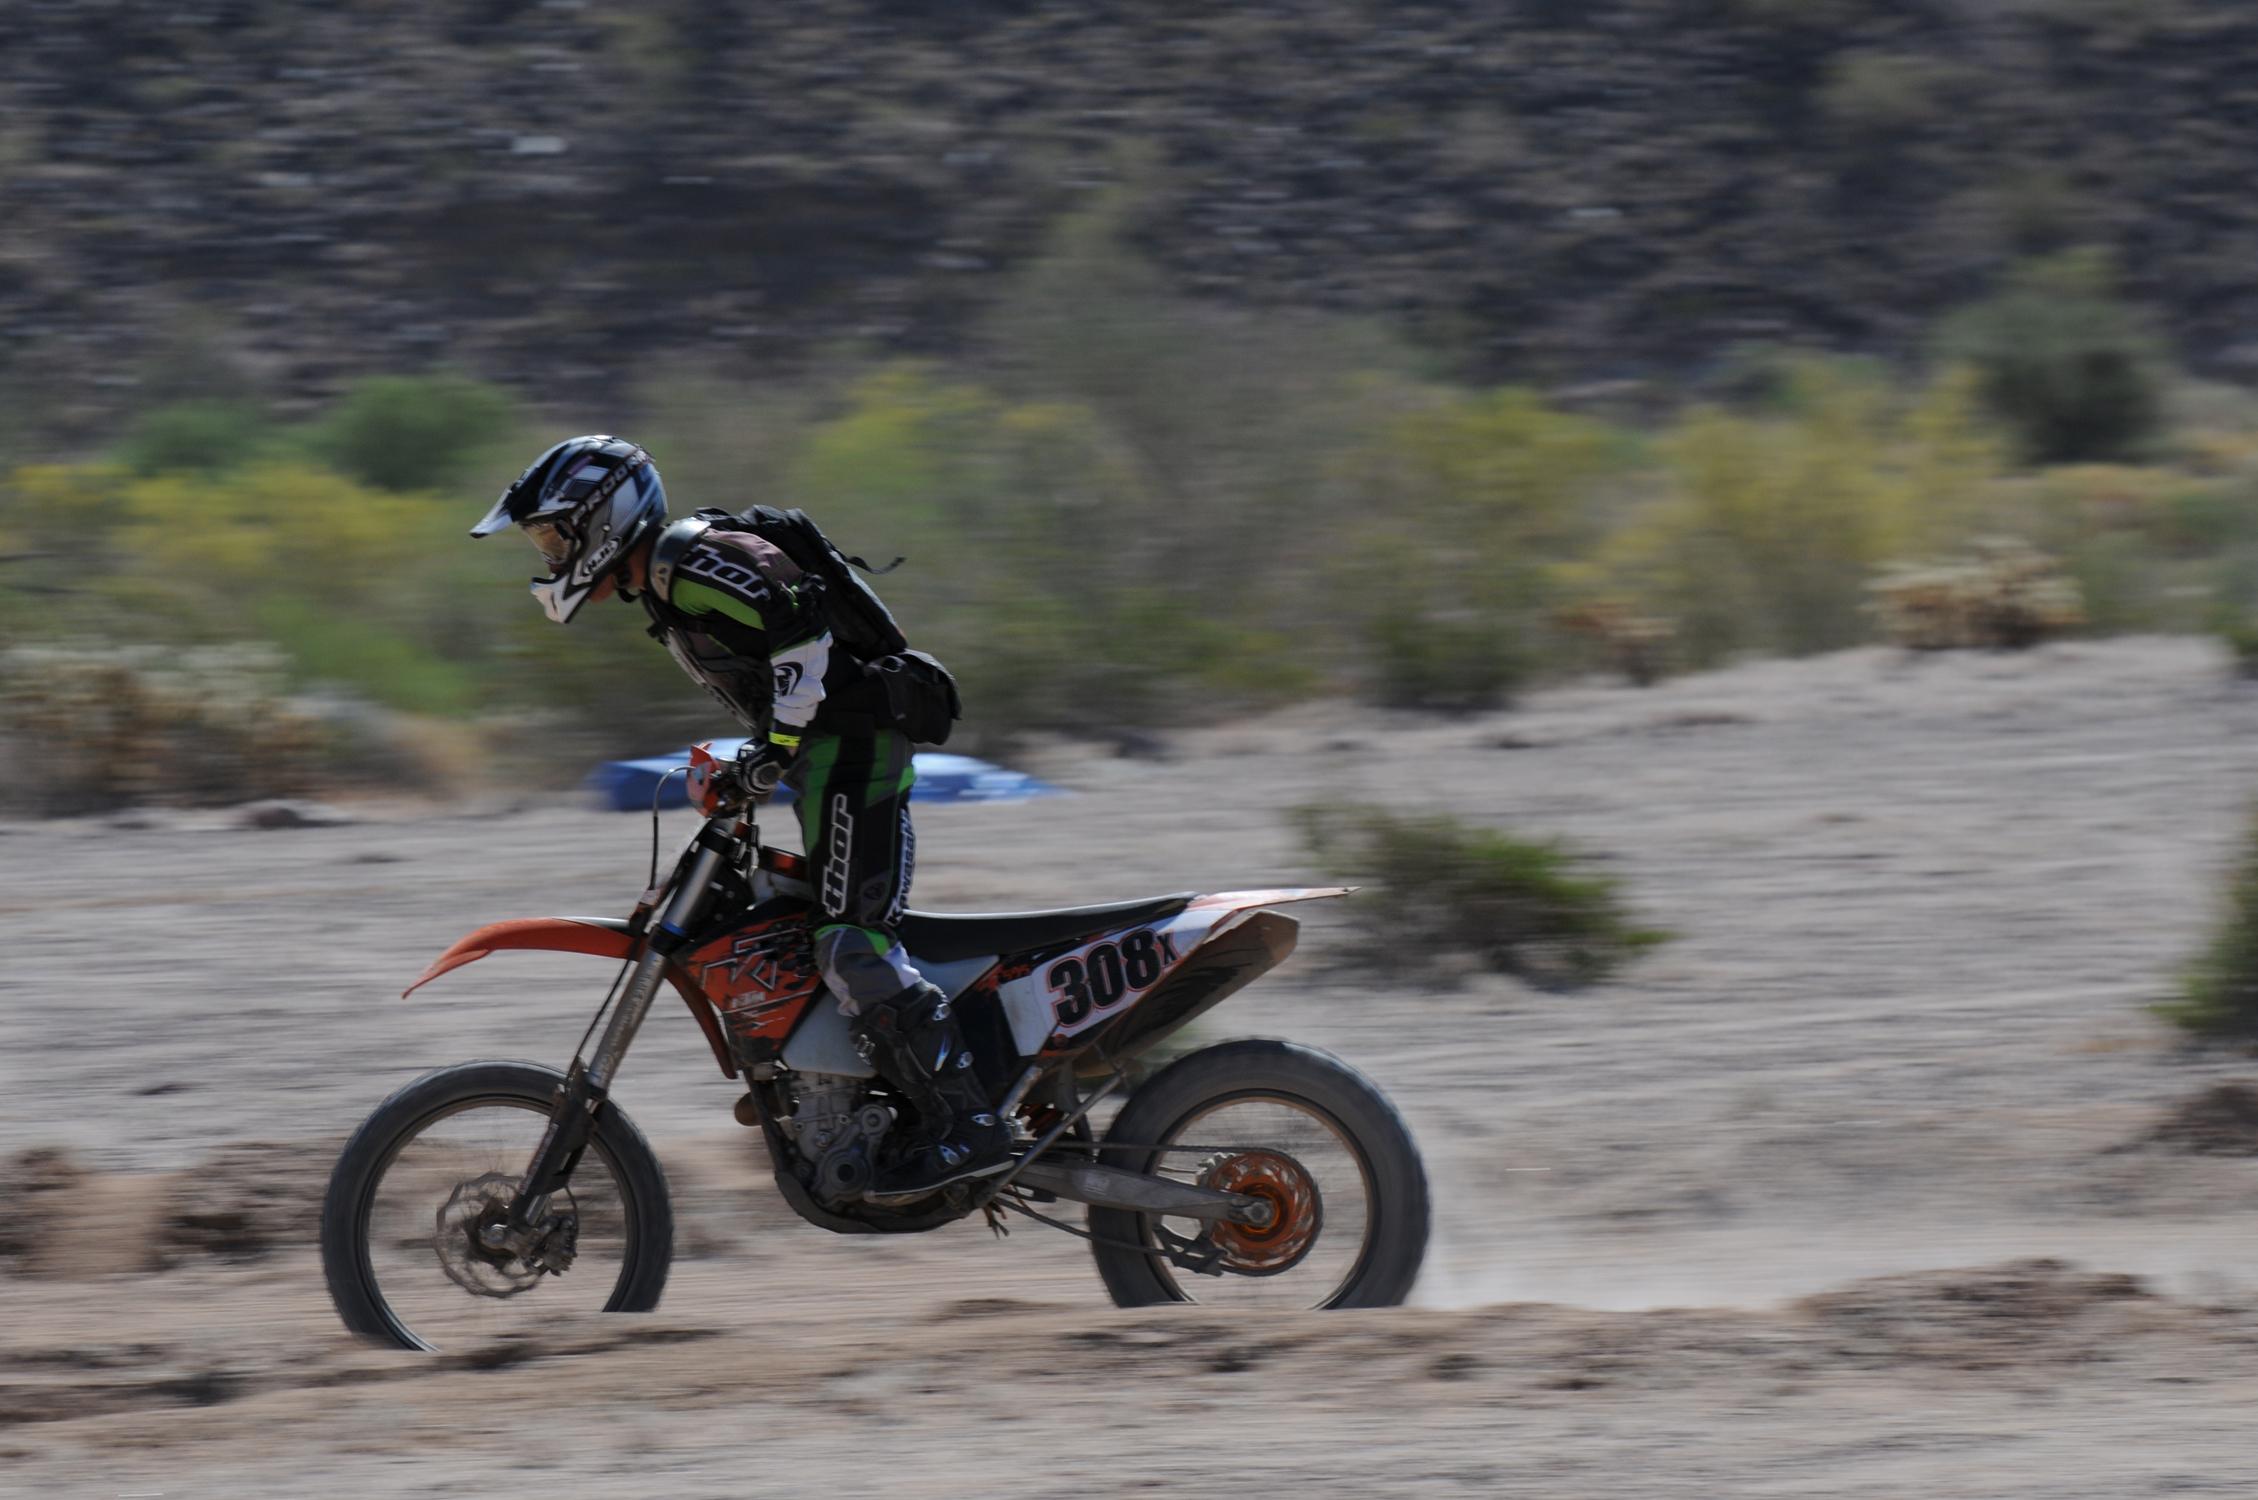 308x-race